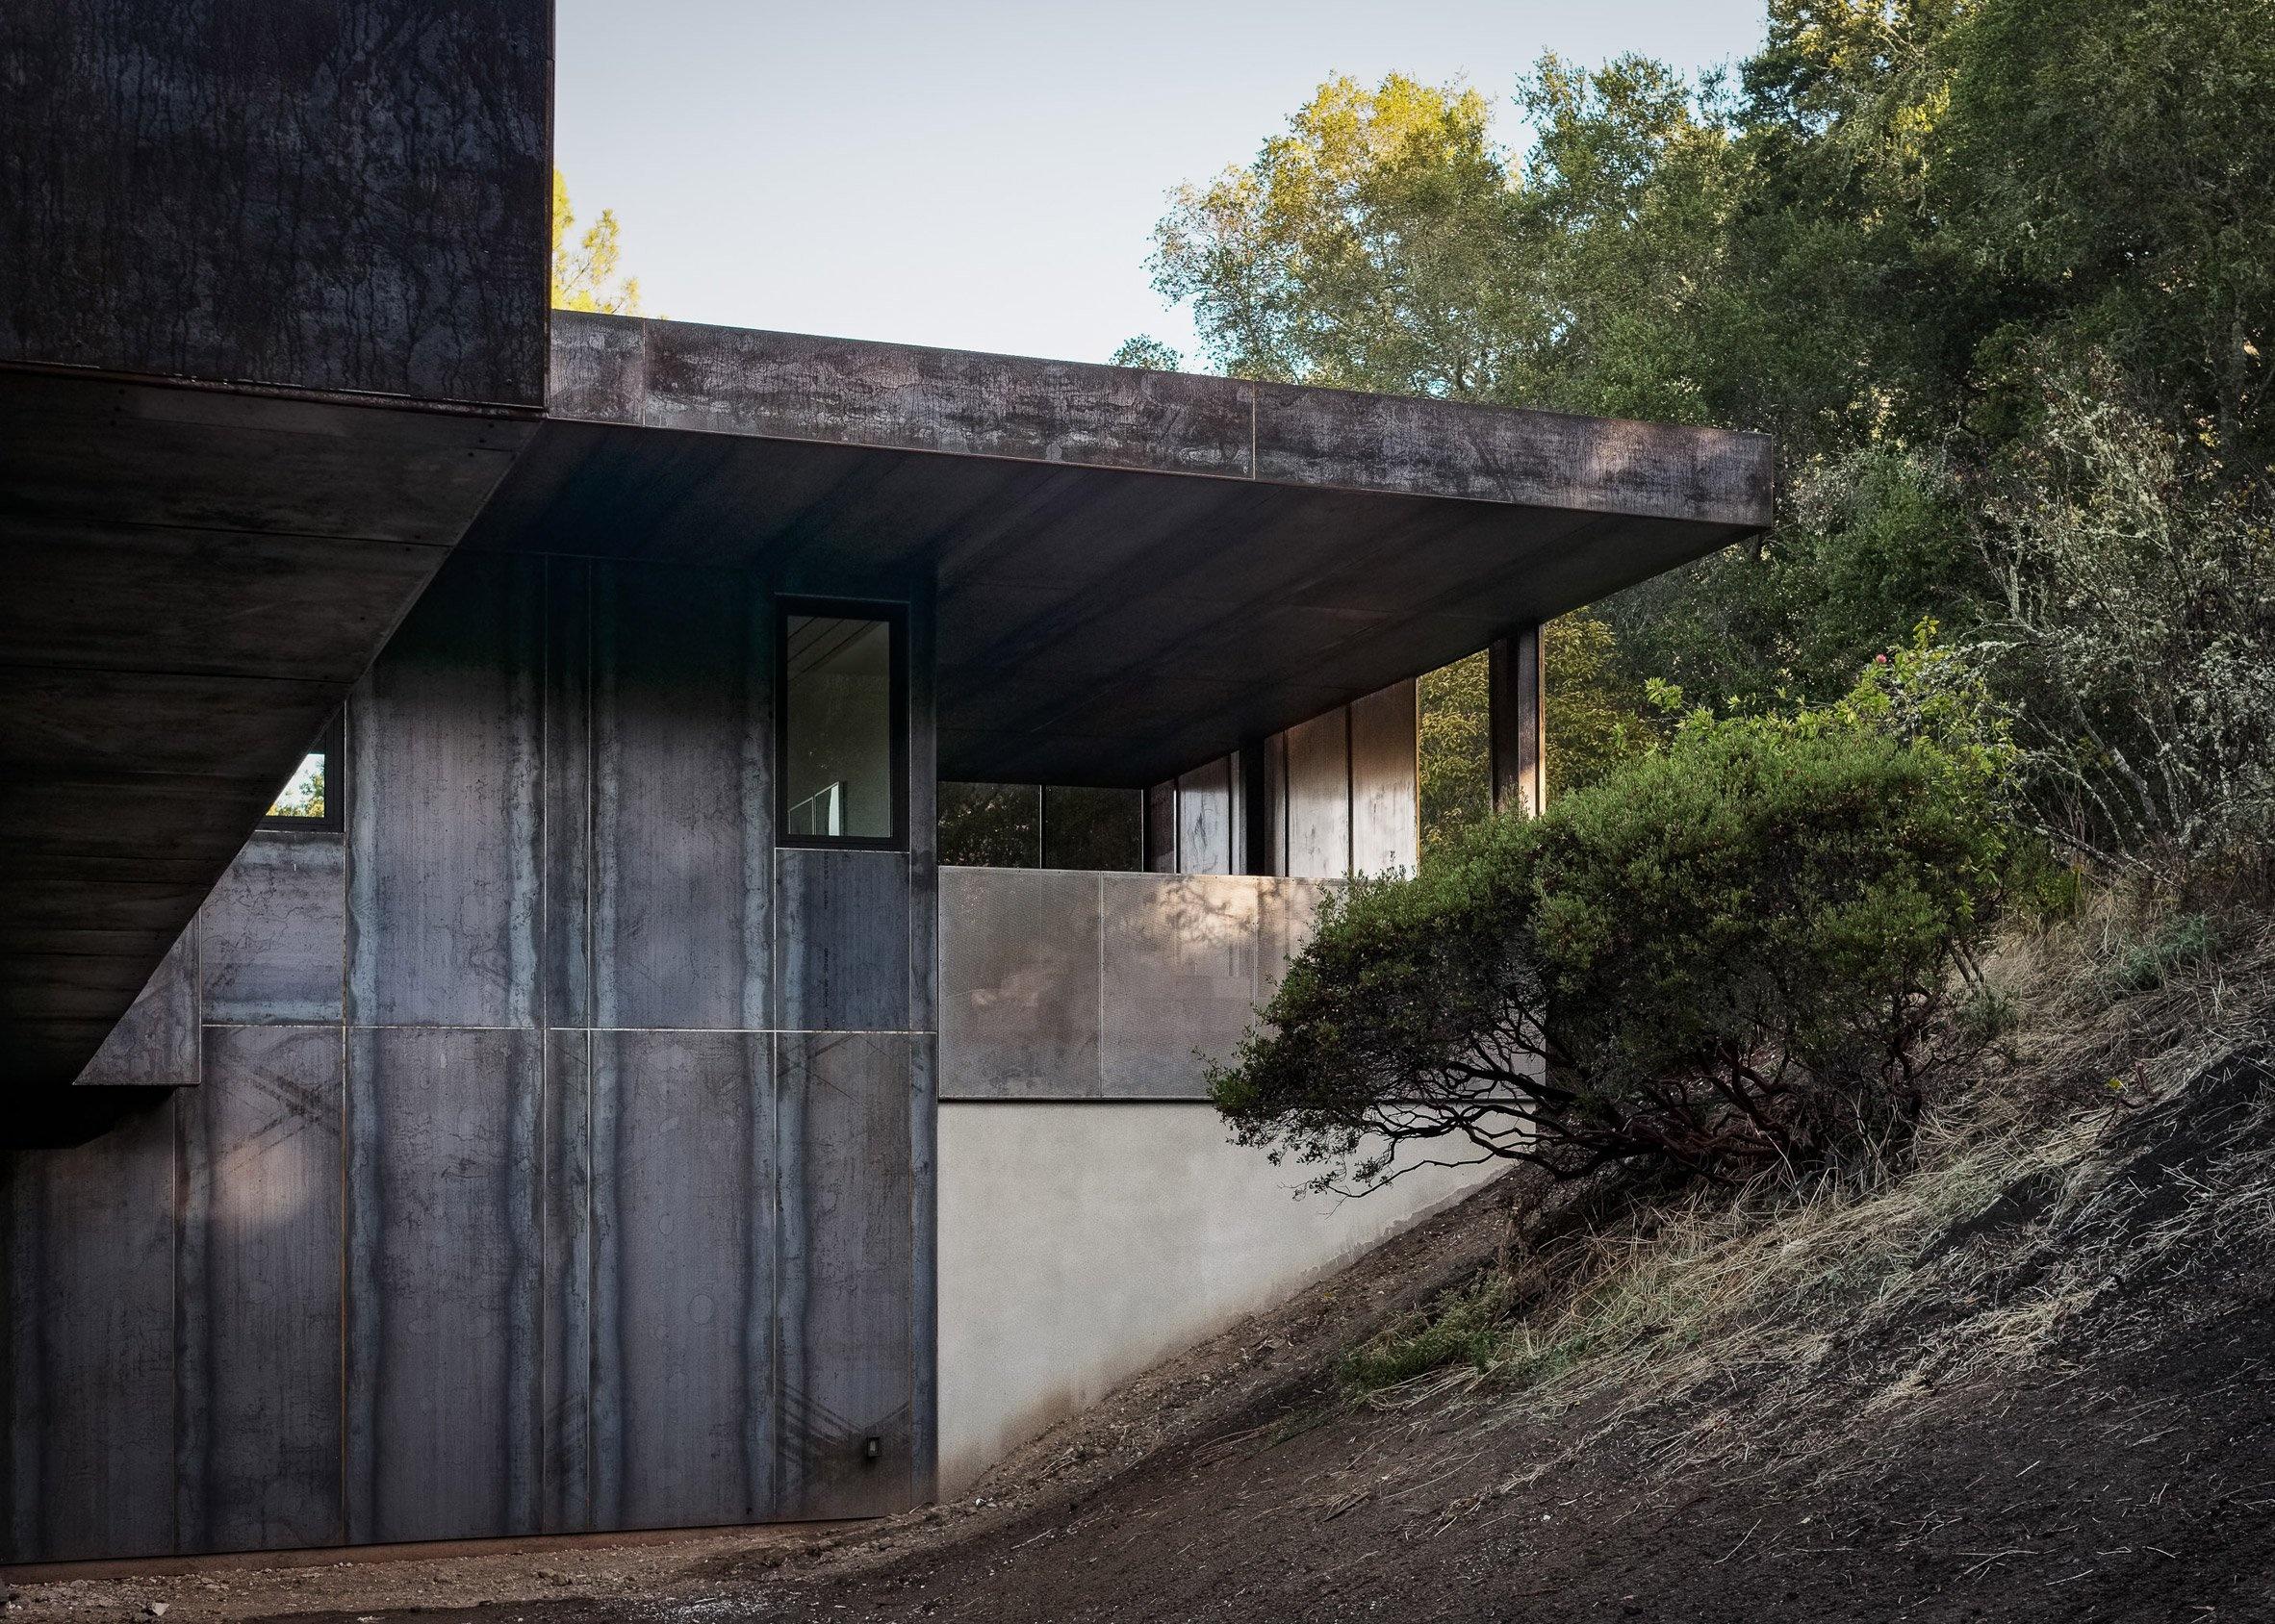 miner-road-faulkner-architects_dezeen_2364_col_50_01